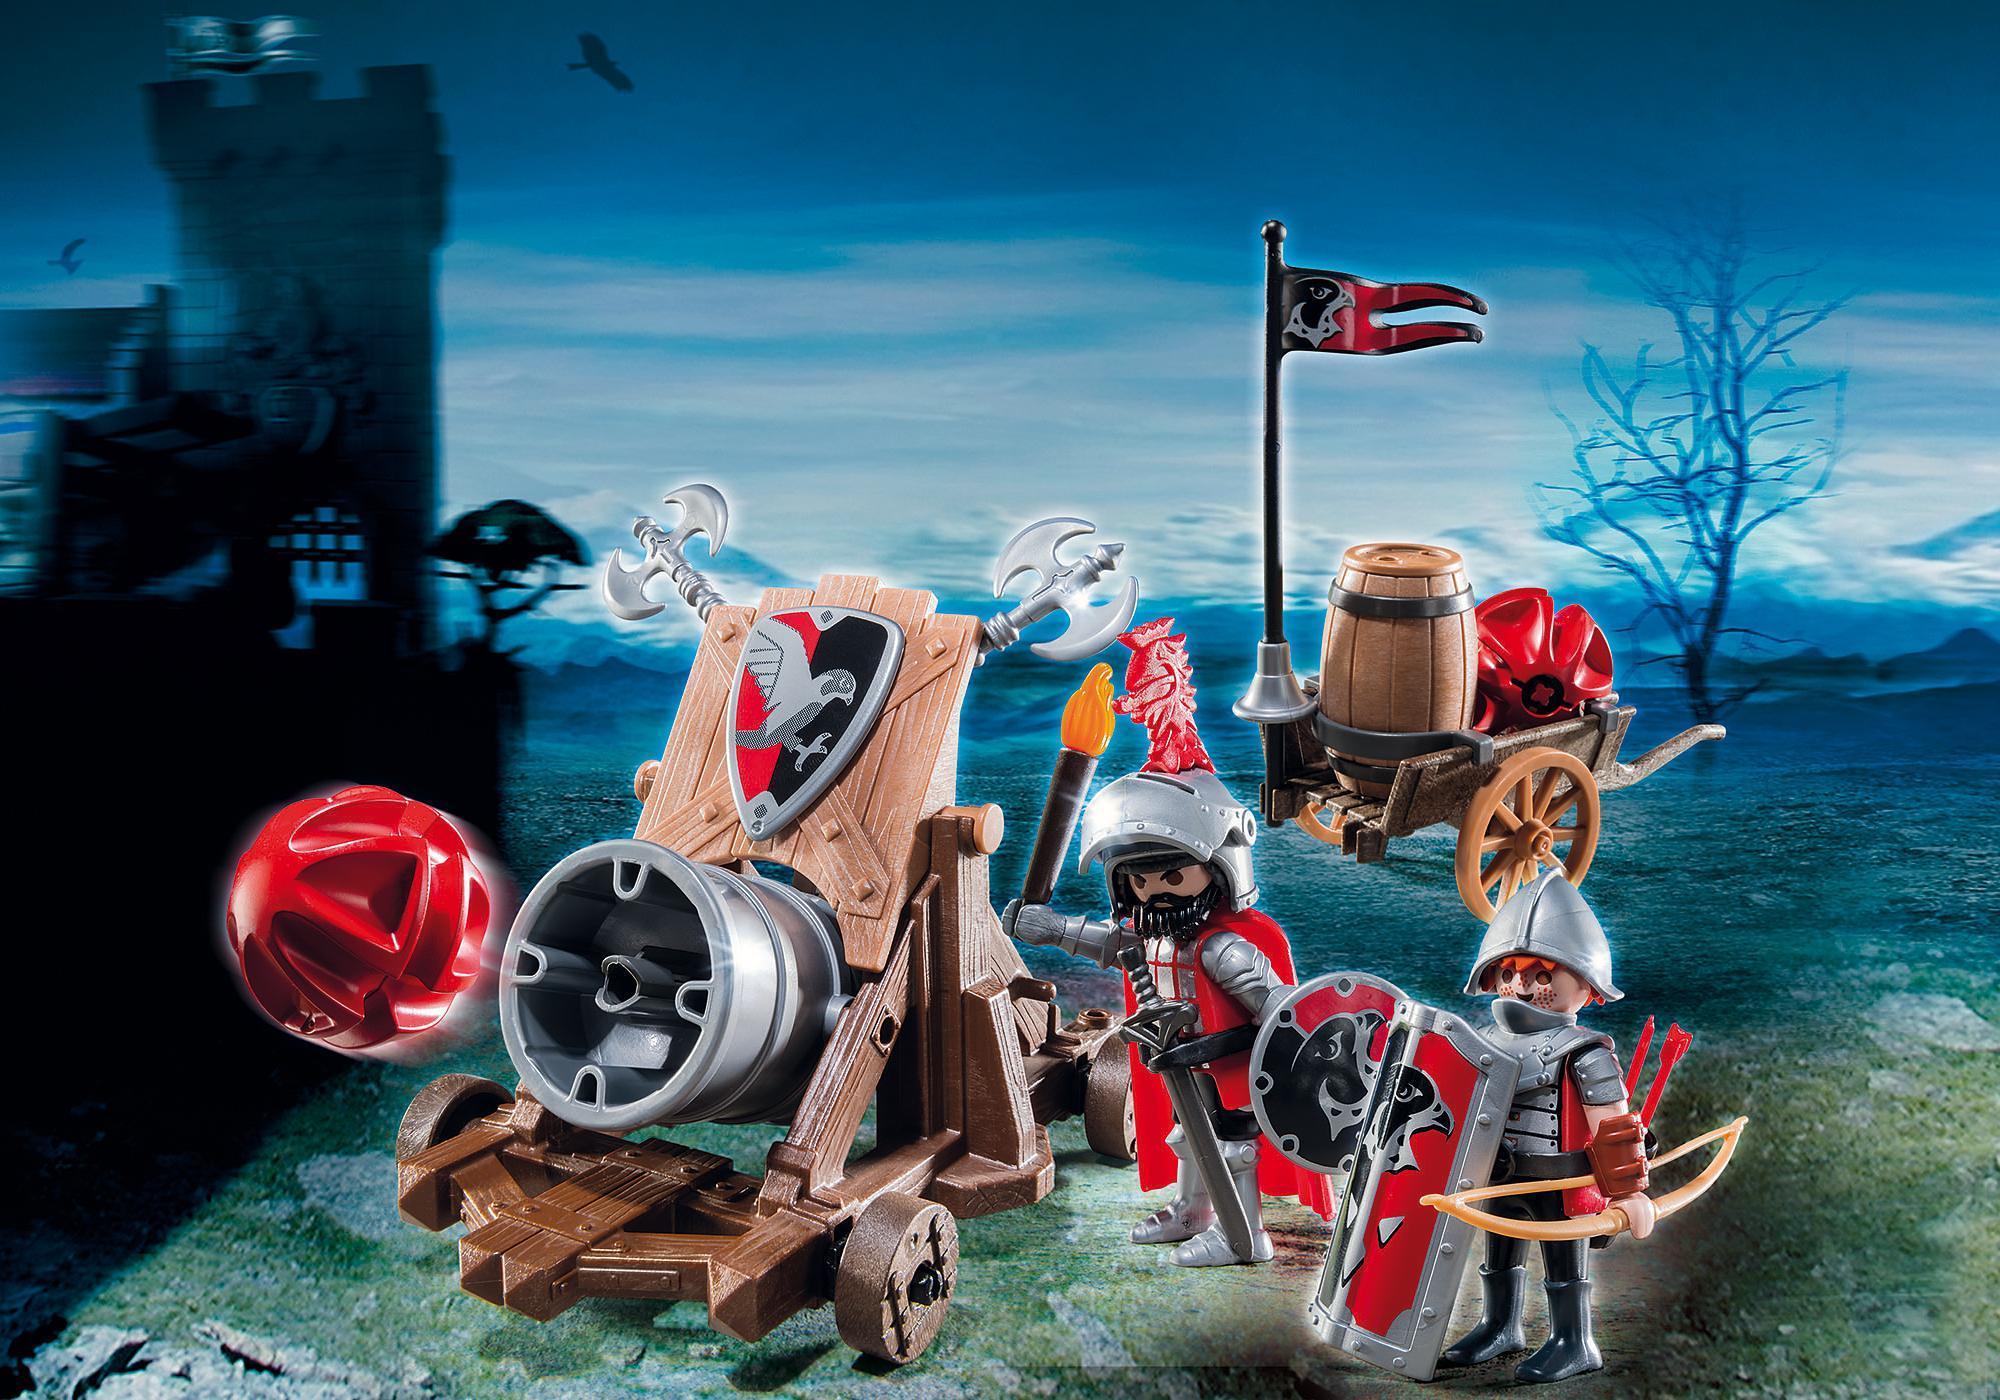 http://media.playmobil.com/i/playmobil/6038_product_detail/Рыцари: Боевая пушка Рыцарей Сокола